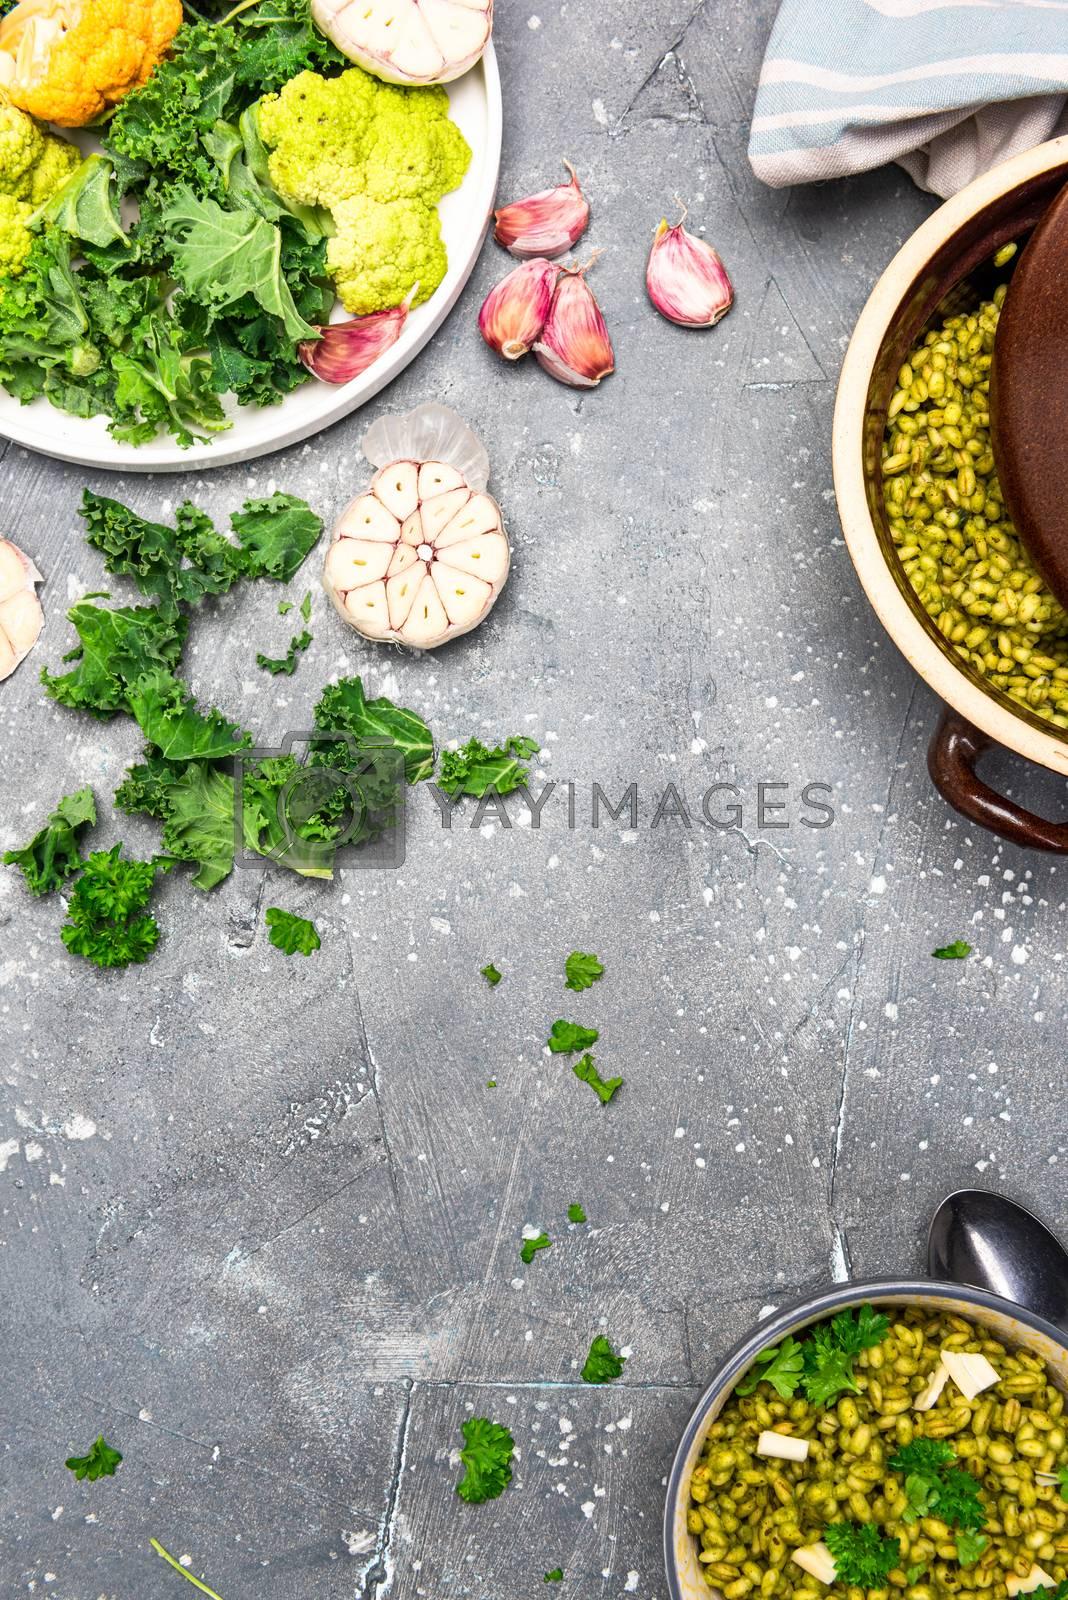 Healthy Eating. Vegetarian Brunch. Green Kale, Garlic and Groats in Bowl.